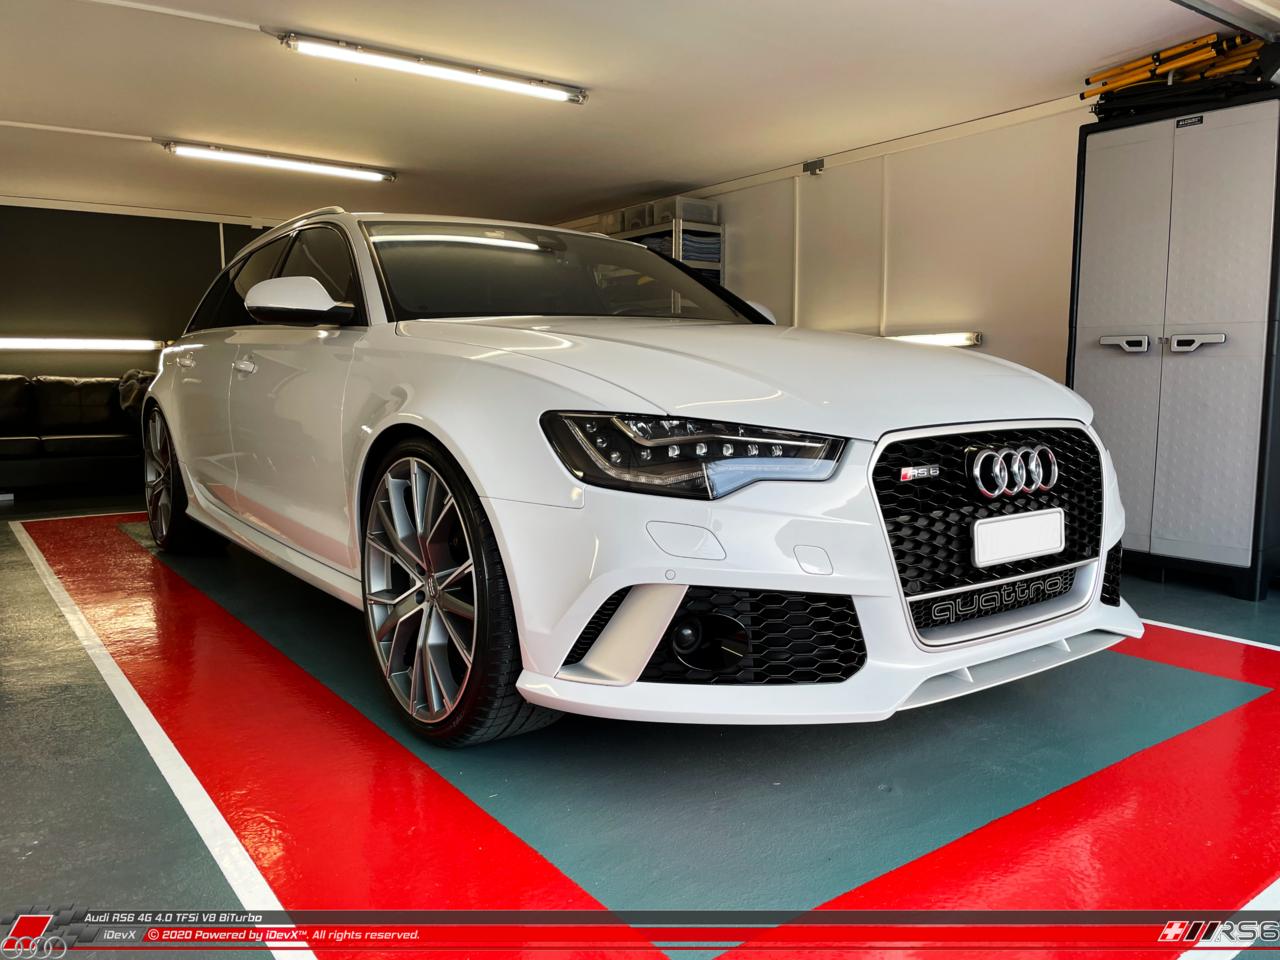 19.02.2021_Audi-RS6_iDevX_001.png